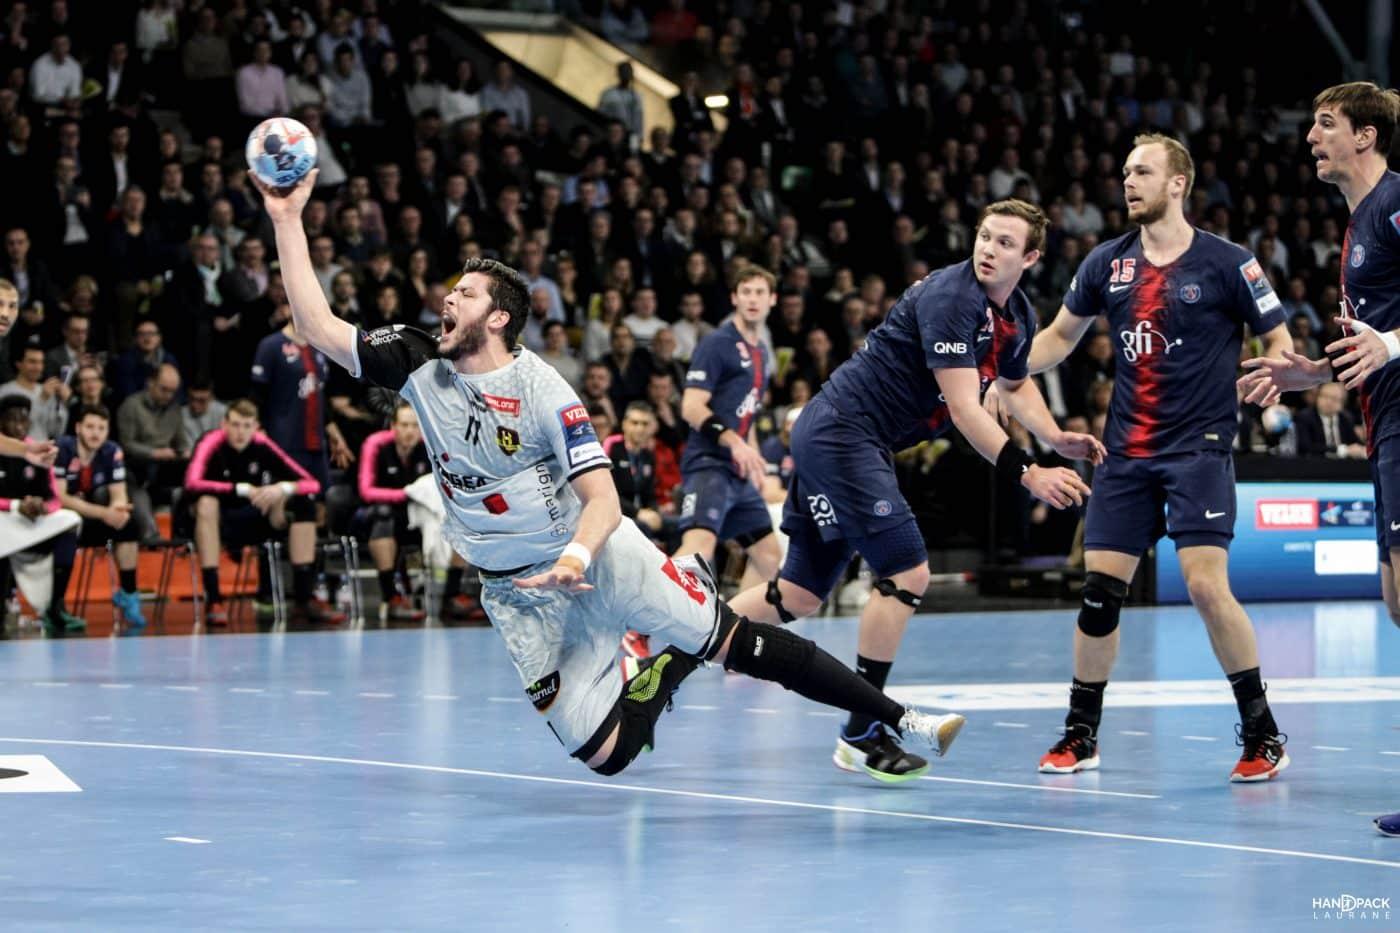 hbc-nantes-paris-saint-germain-handball-ligue-des-champions-2019-handpack-11